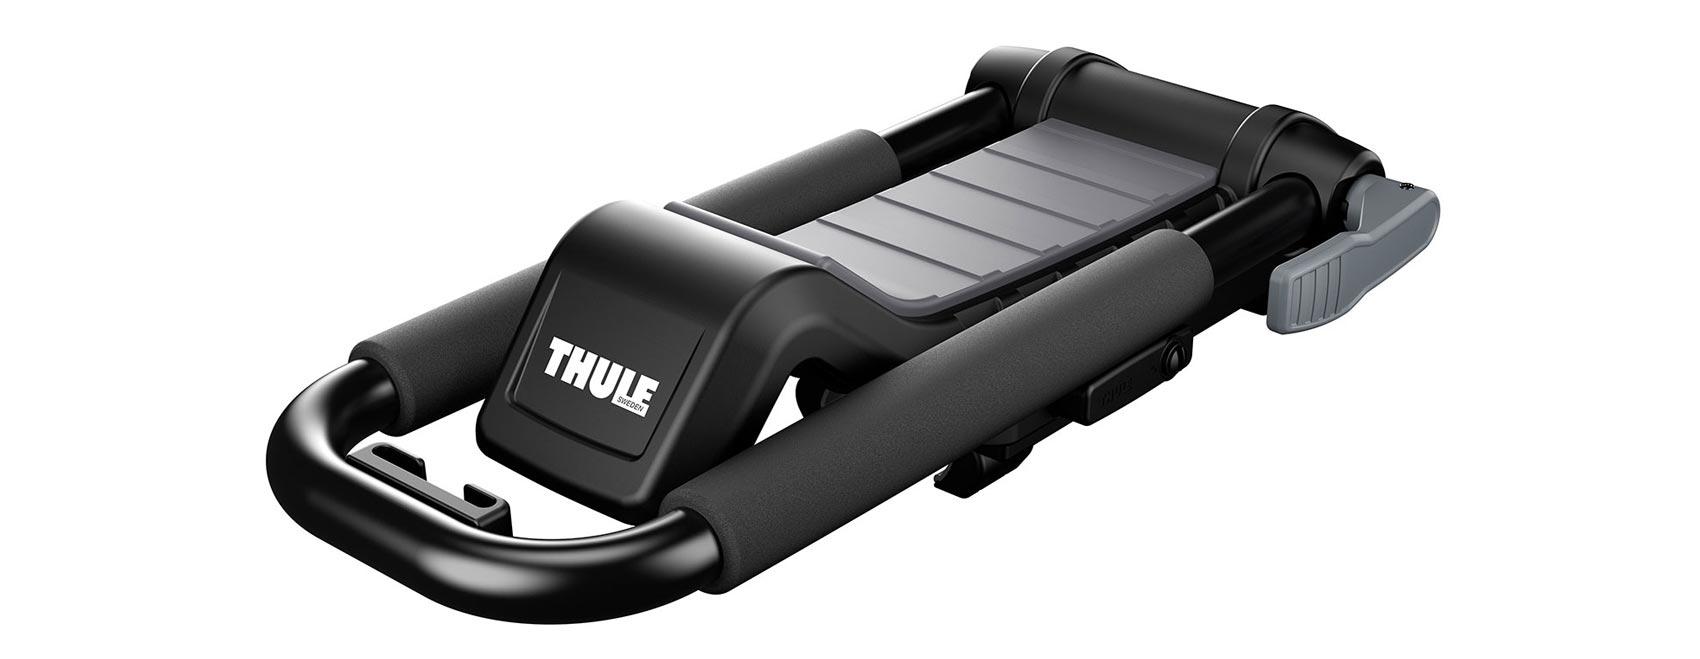 Thule Hullavator Pro - lift assist rack